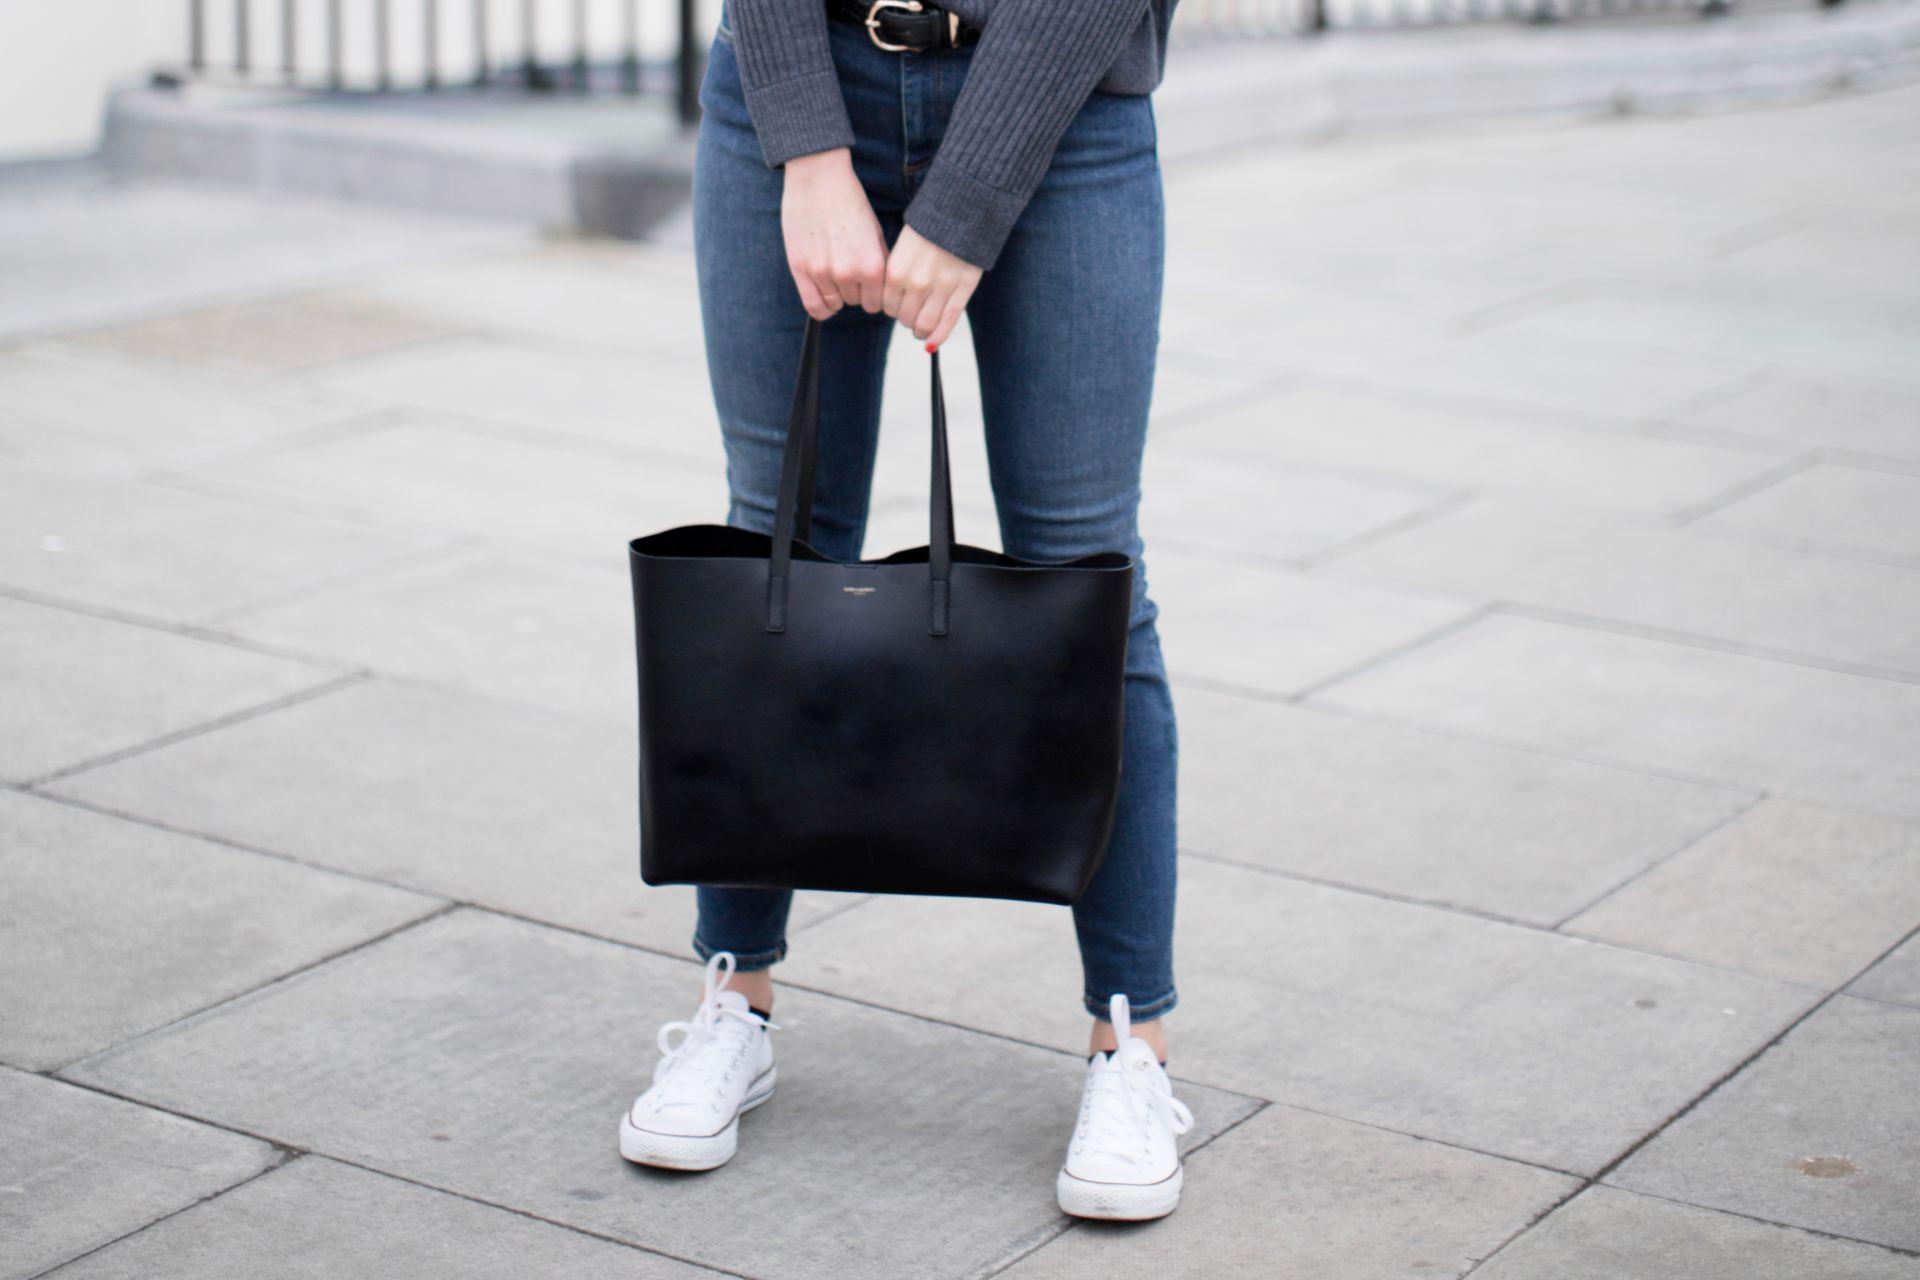 Saint Laurent Tote Bag Review The Anna Edit